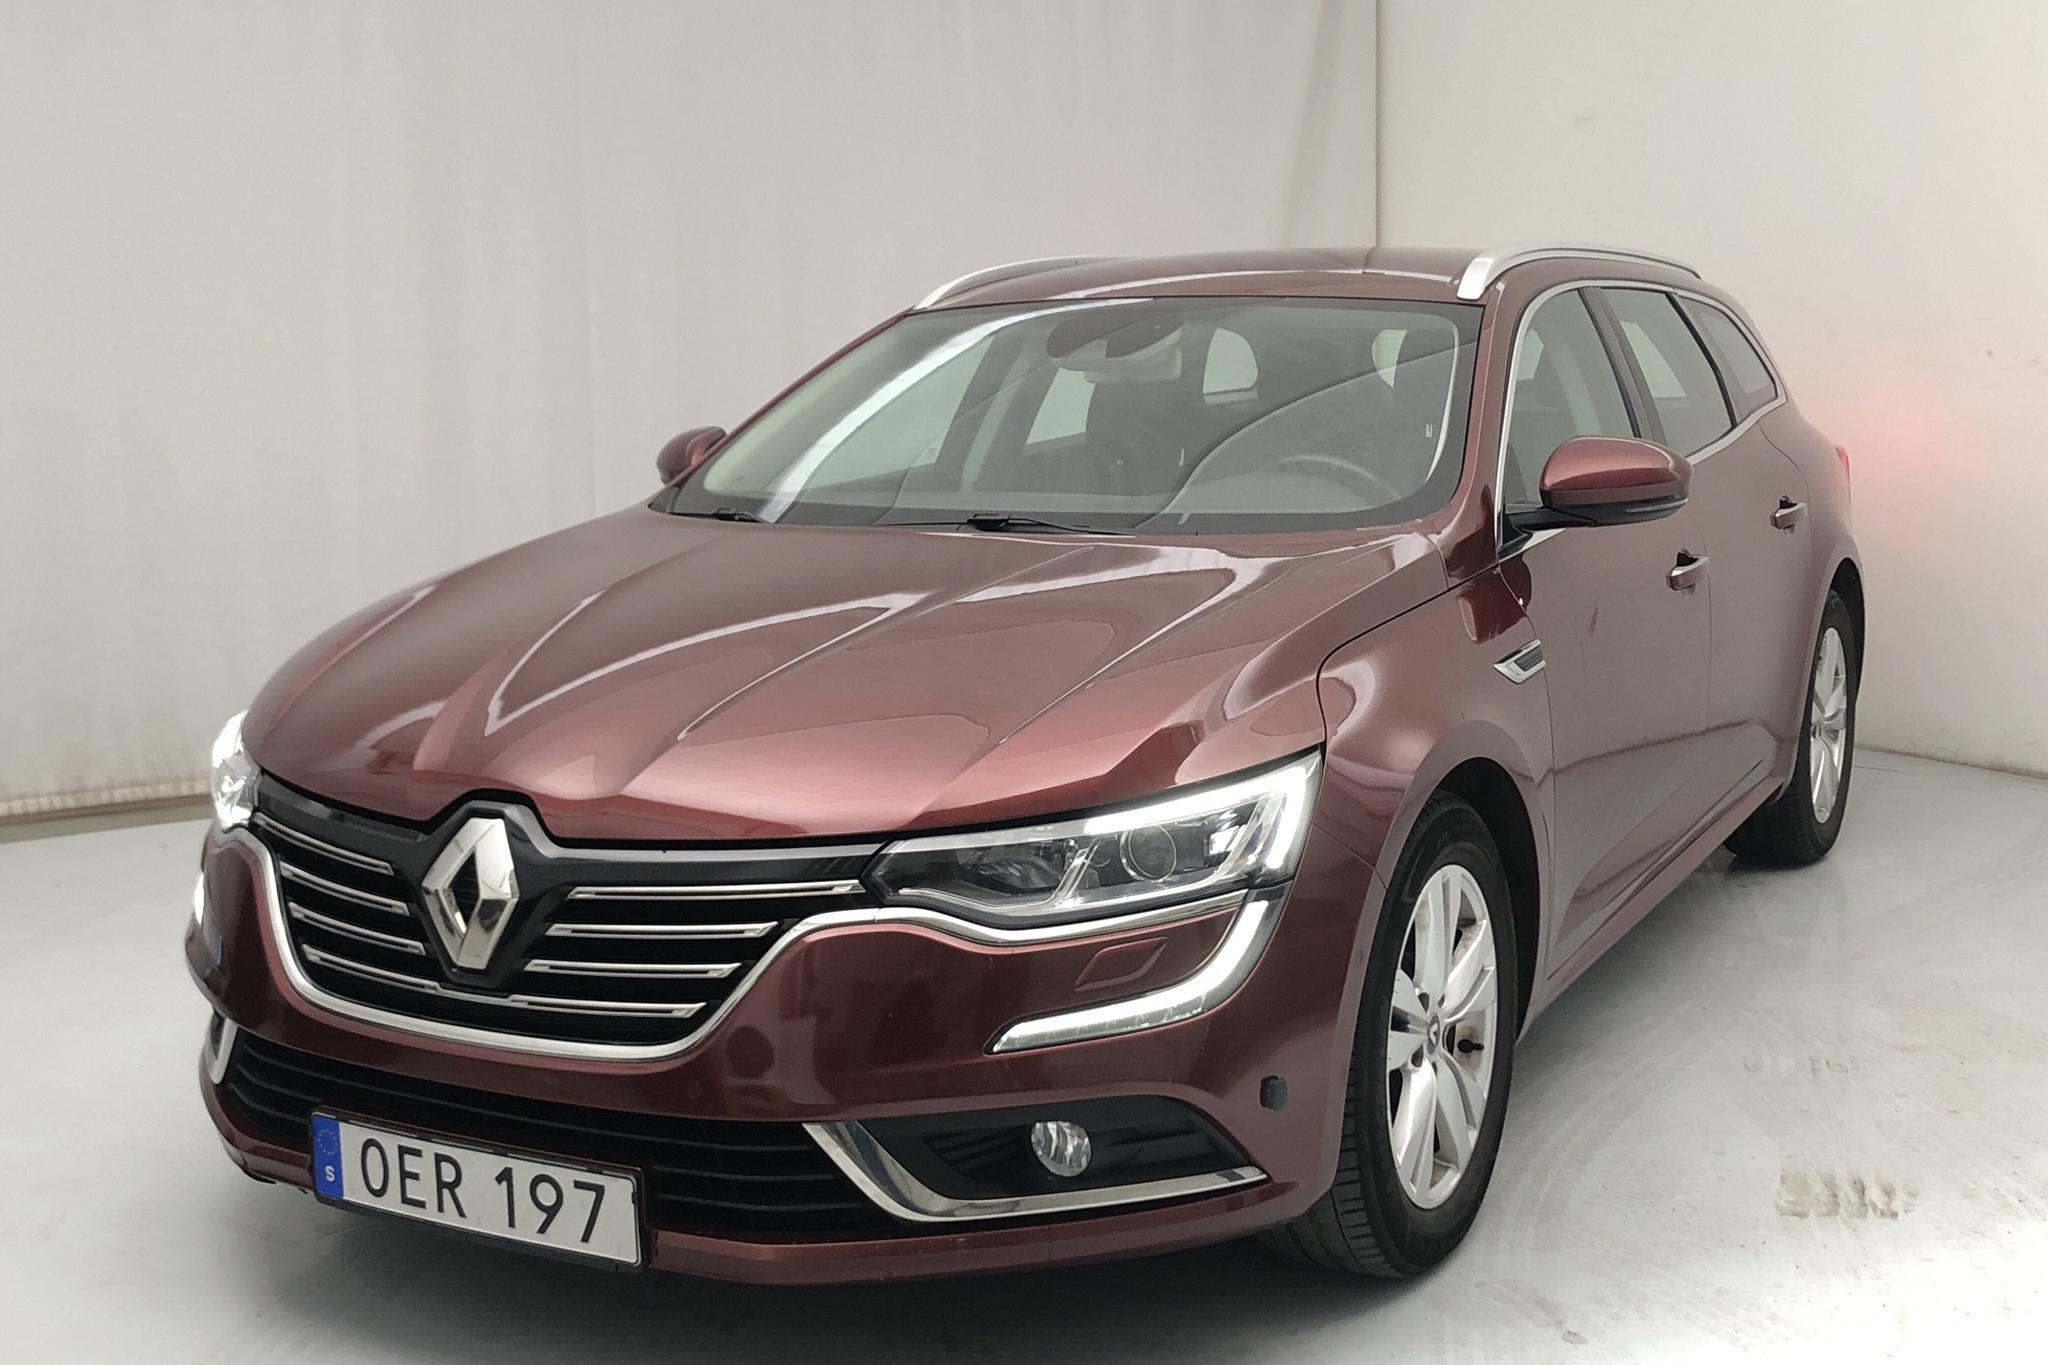 Renault Talisman 1.5 dCi Kombi (110hk)